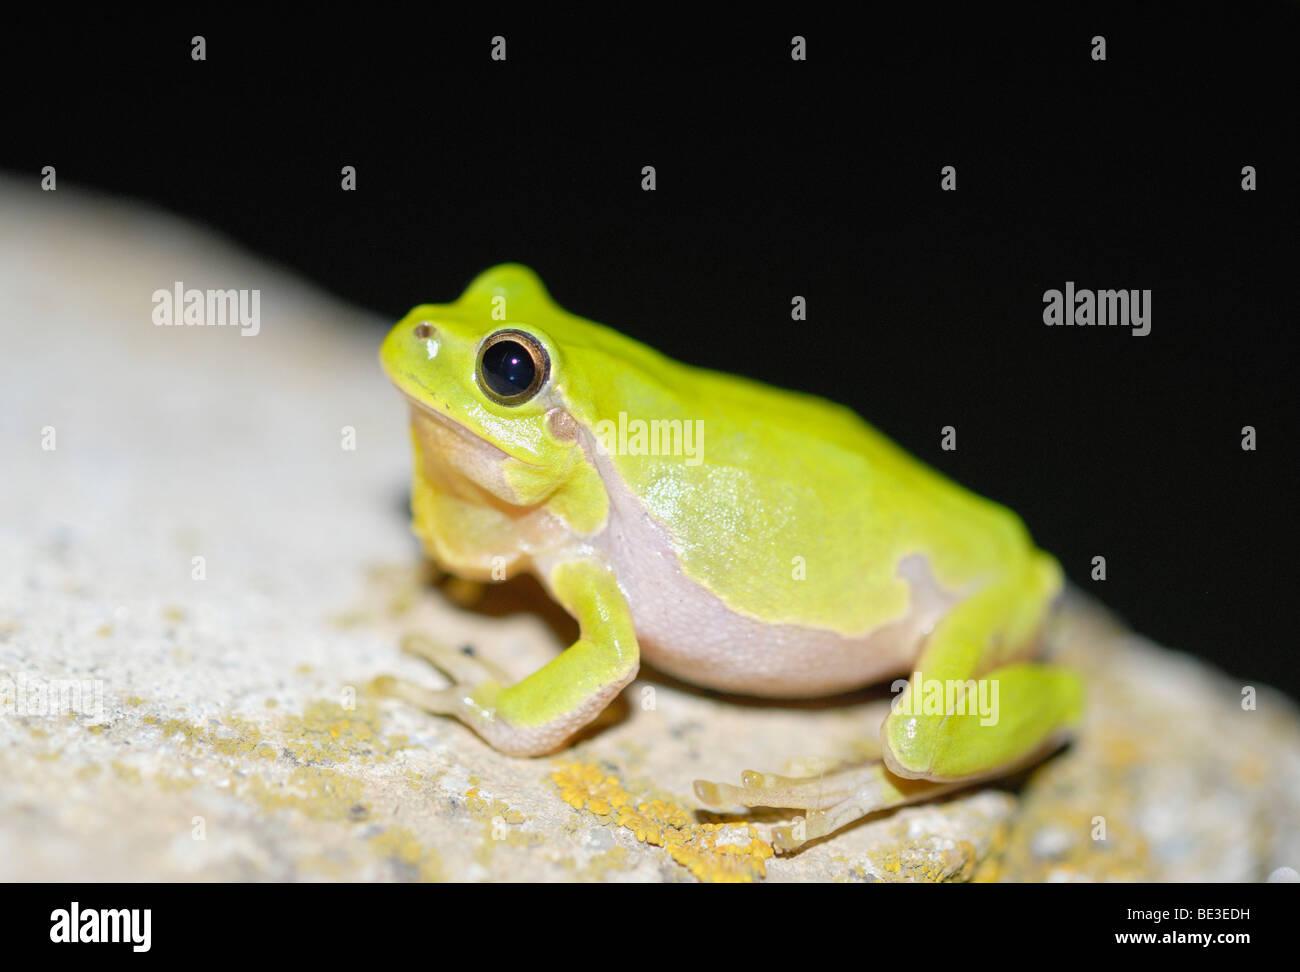 Croaking European tree frog (Hyla arborea) - Stock Image